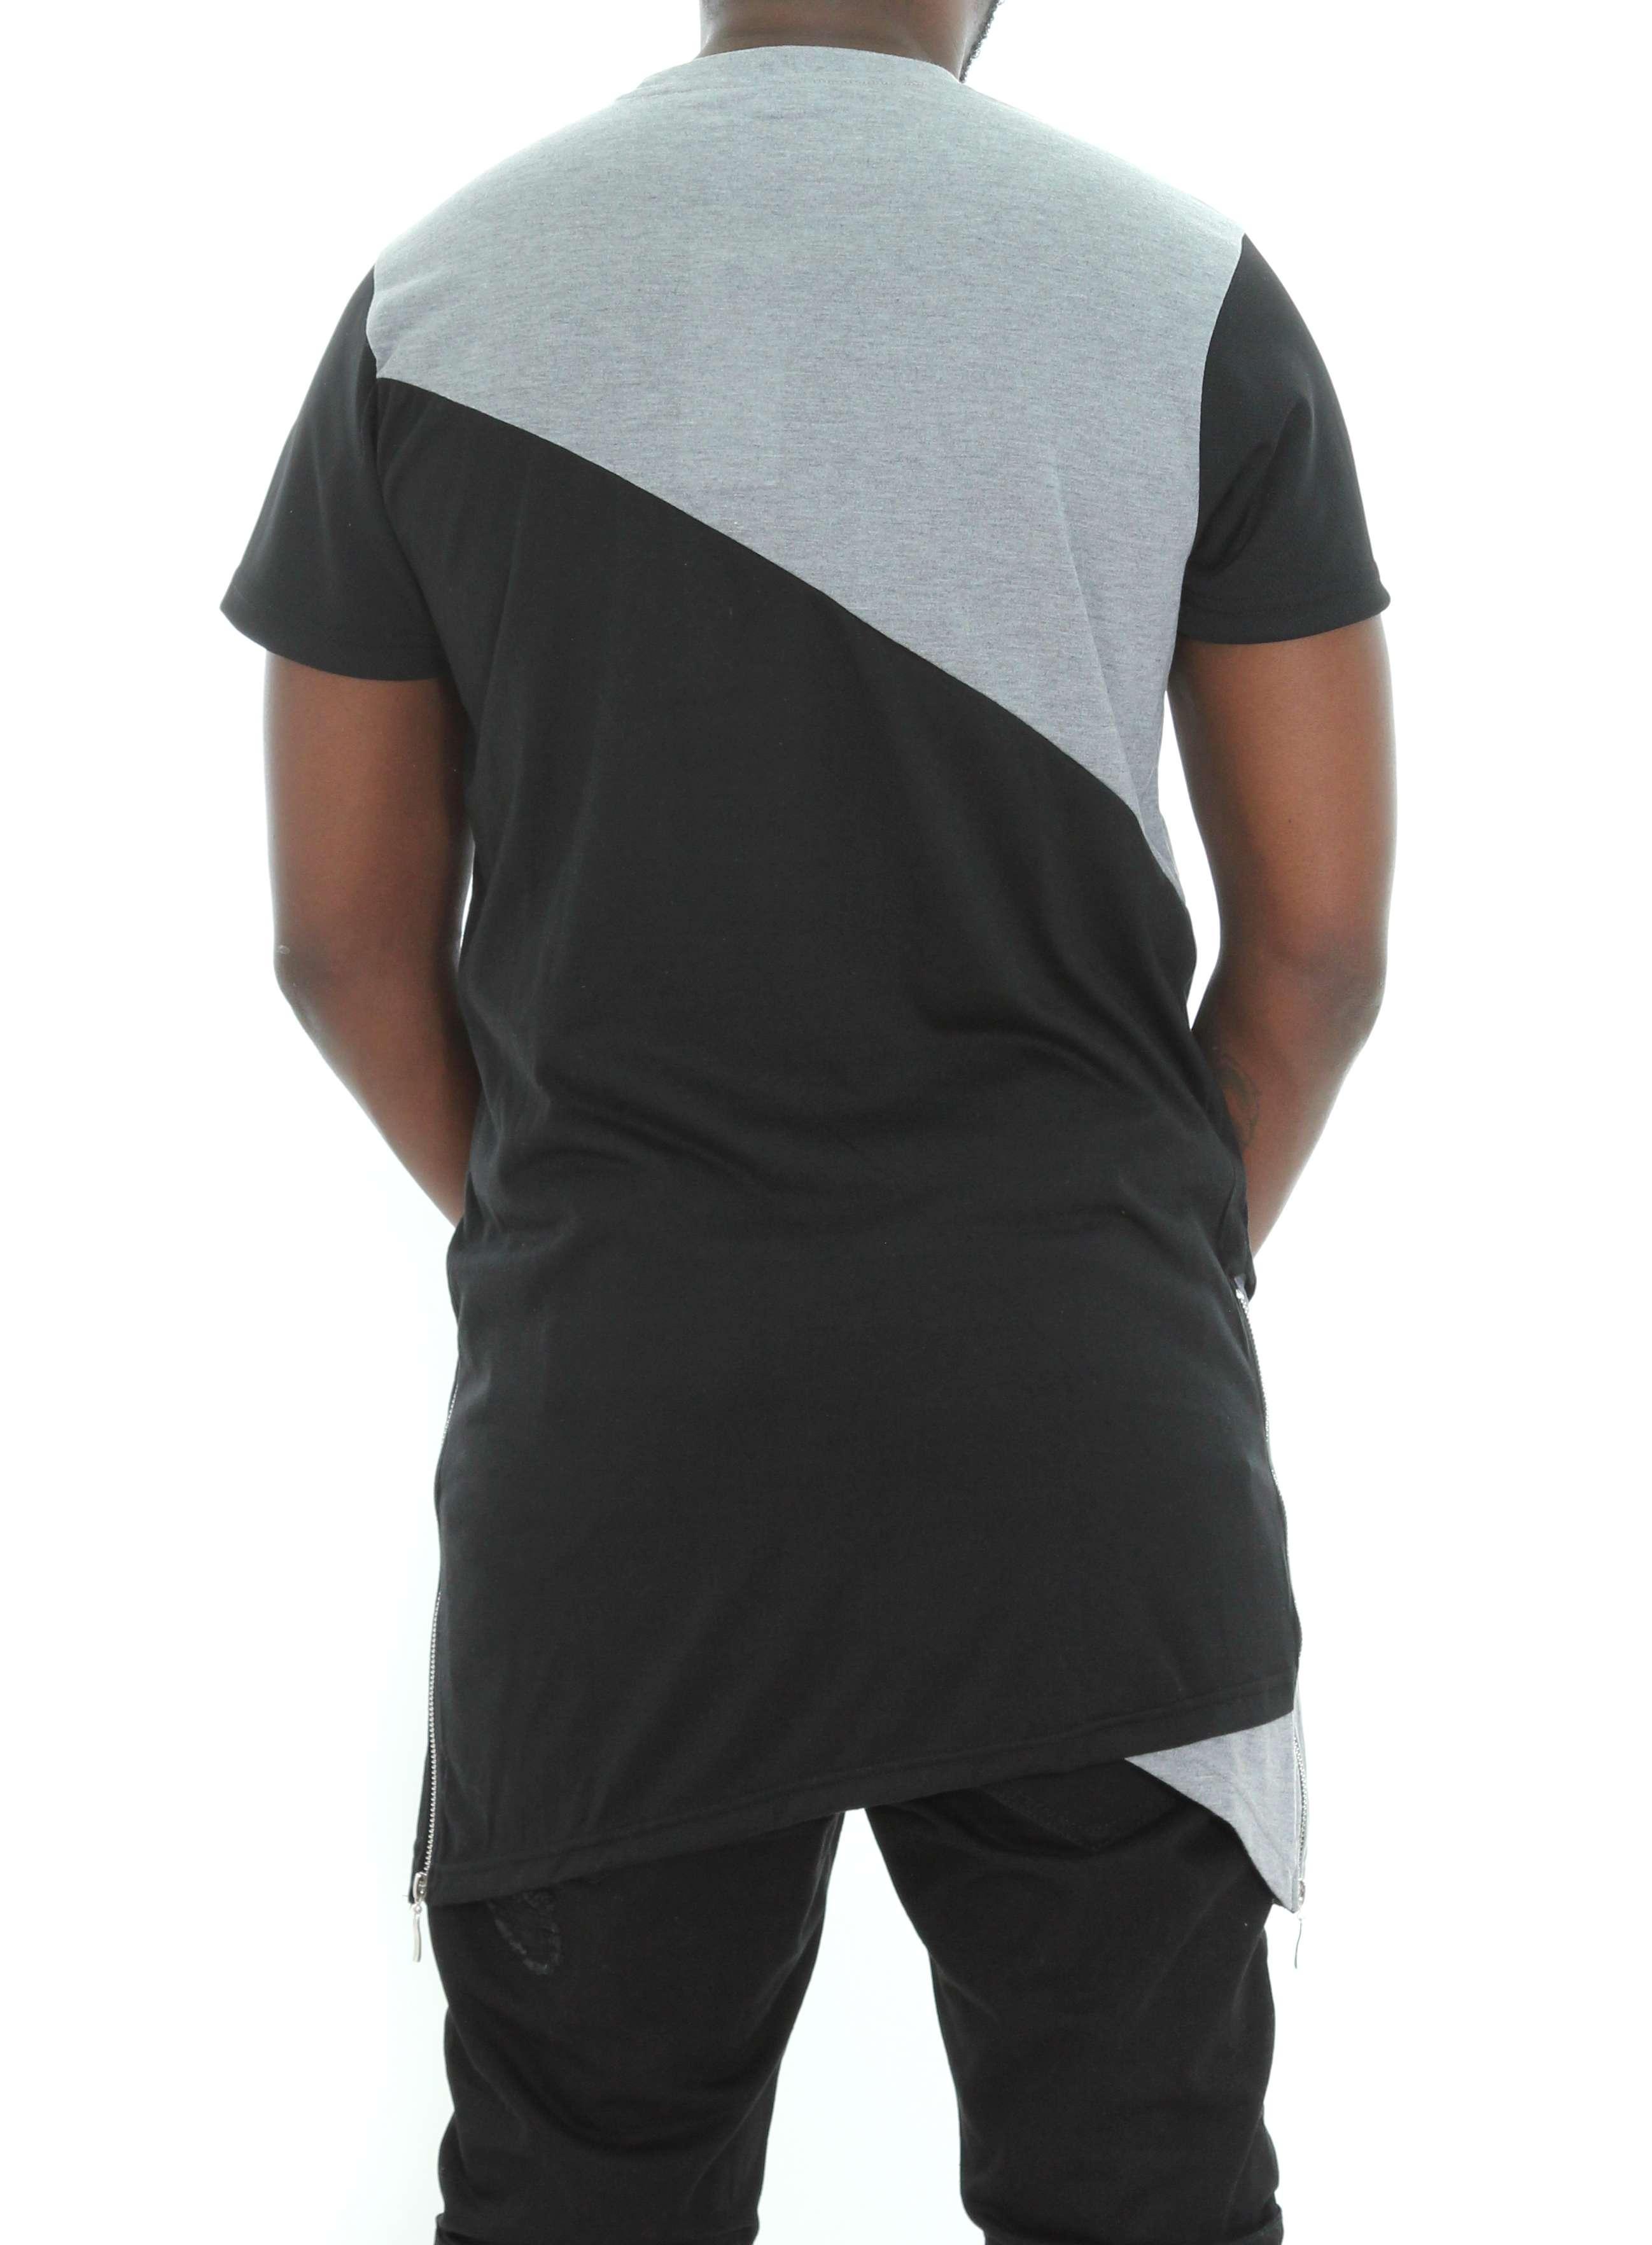 Imperious-Men-039-s-Colorblock-Asymmetric-Hem-Side-Zipper-Longline-T-Shirt thumbnail 8